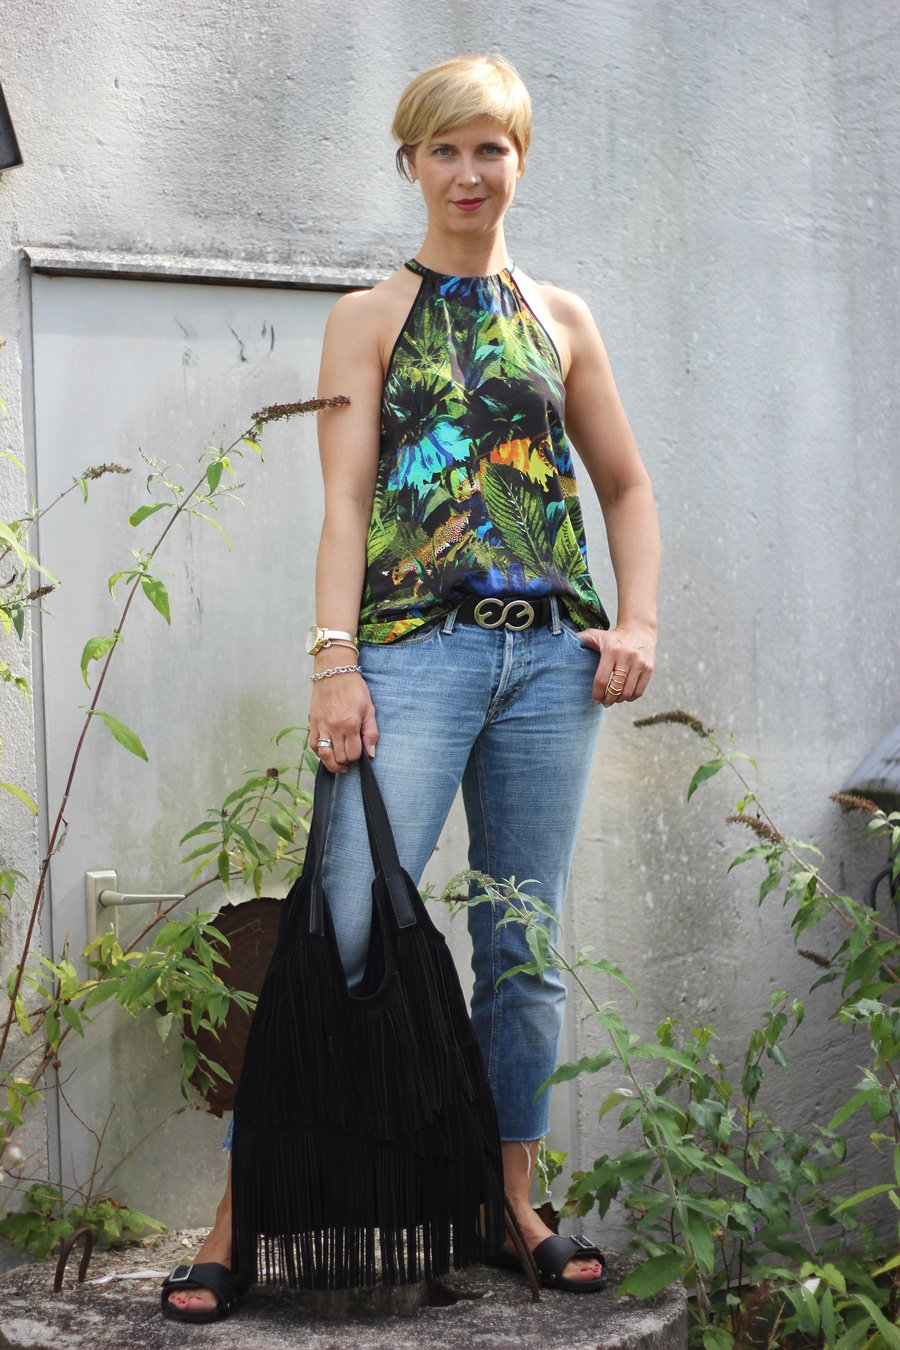 Großstadtdschungel, schulterfreies Top, cropped Jeans, Pantoletten, Conny Doll, Fransentasche, Sommerlook